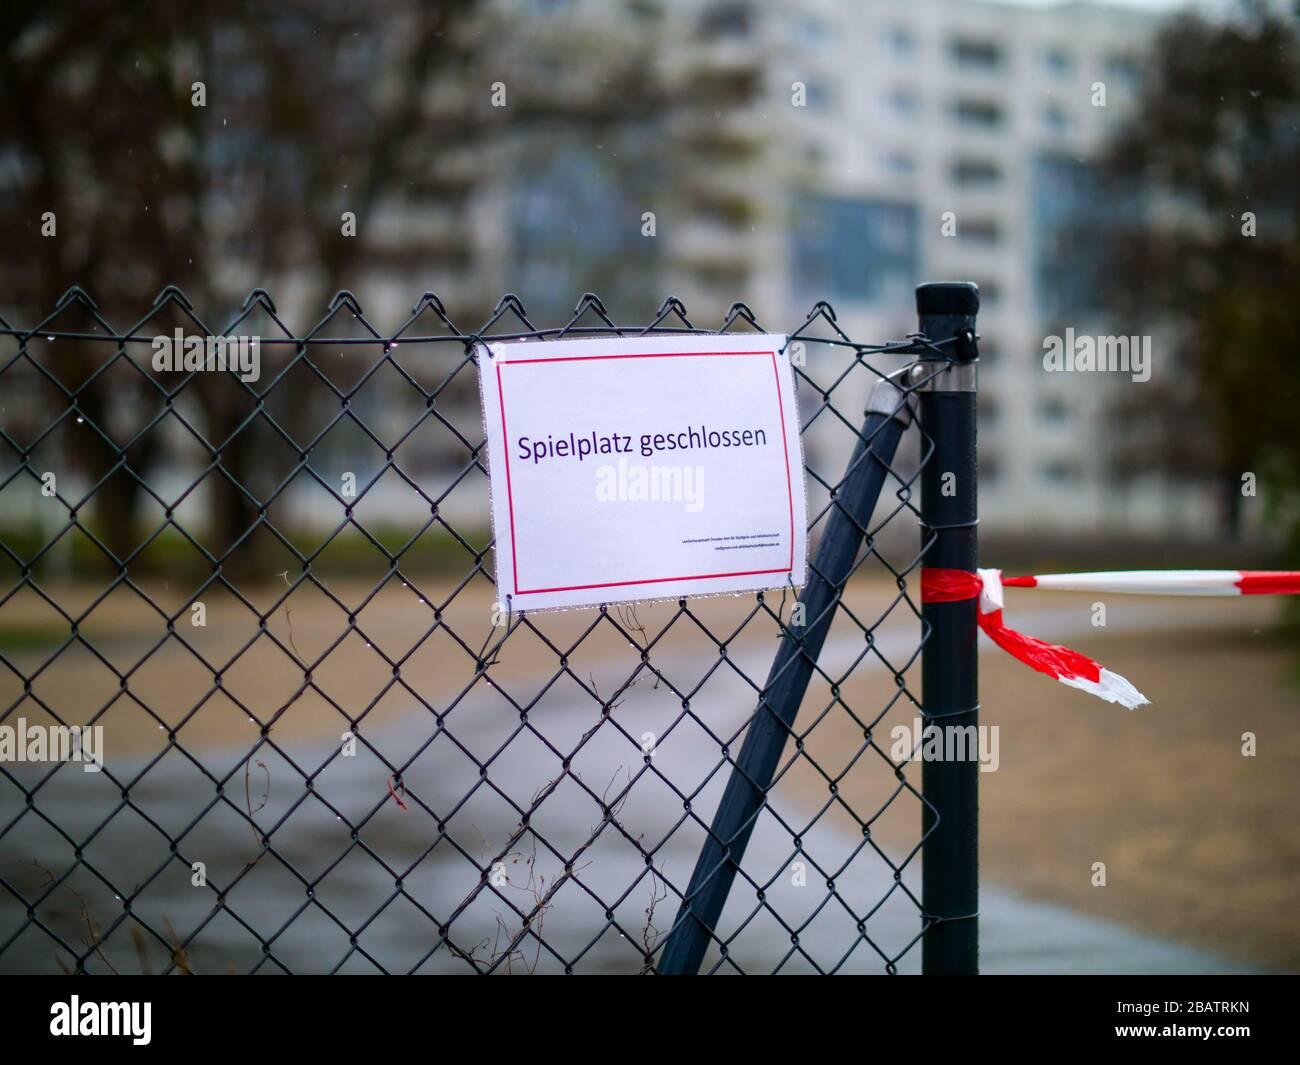 Spielplatz geschlossen wegen coronavirus Lockdown Ausgangssperre Banque D'Images